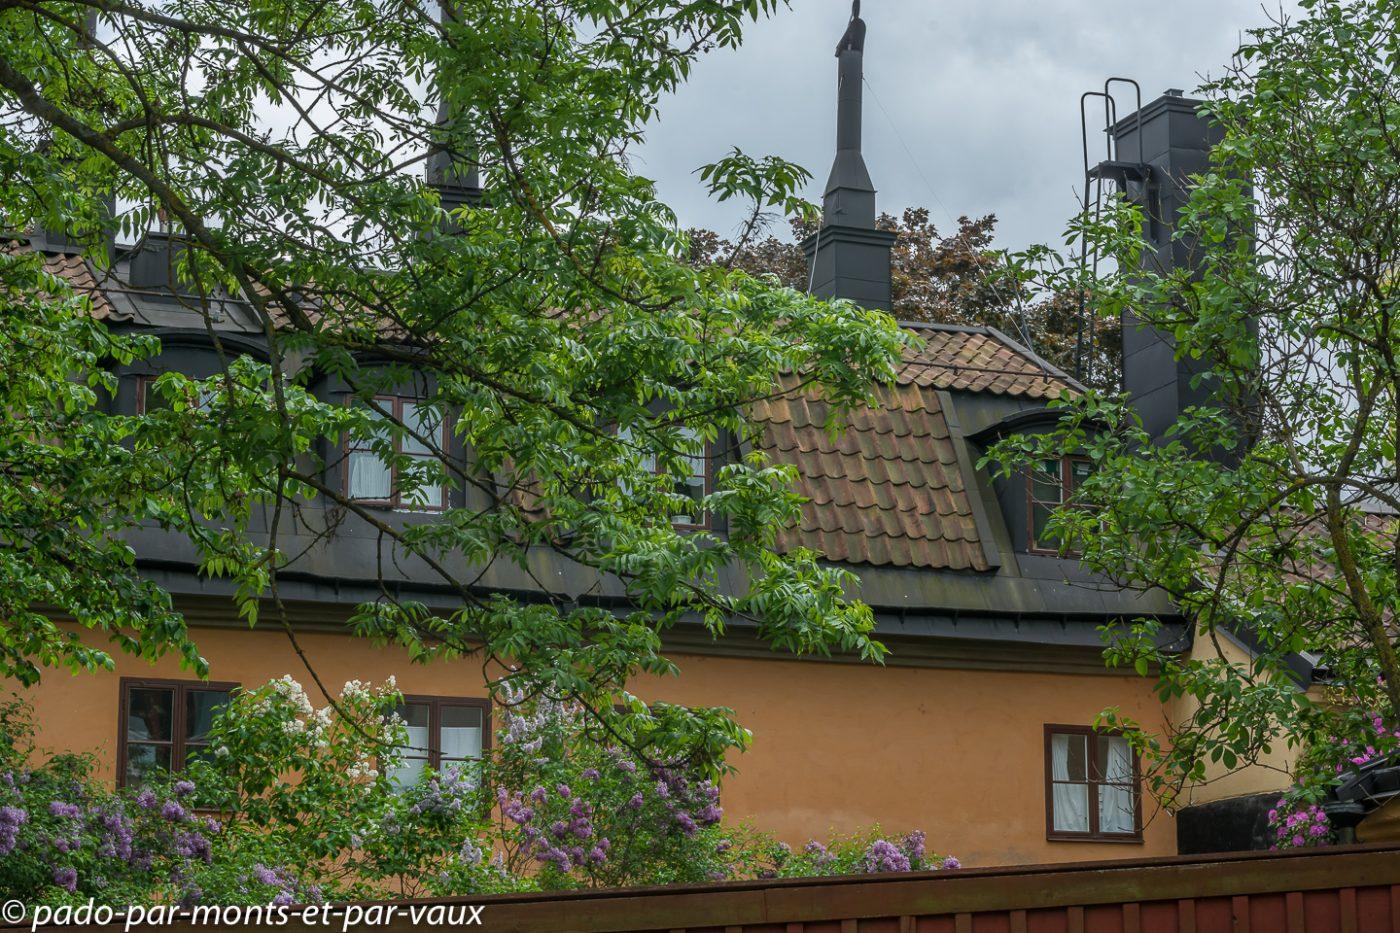 Stockholm - Sodermalm